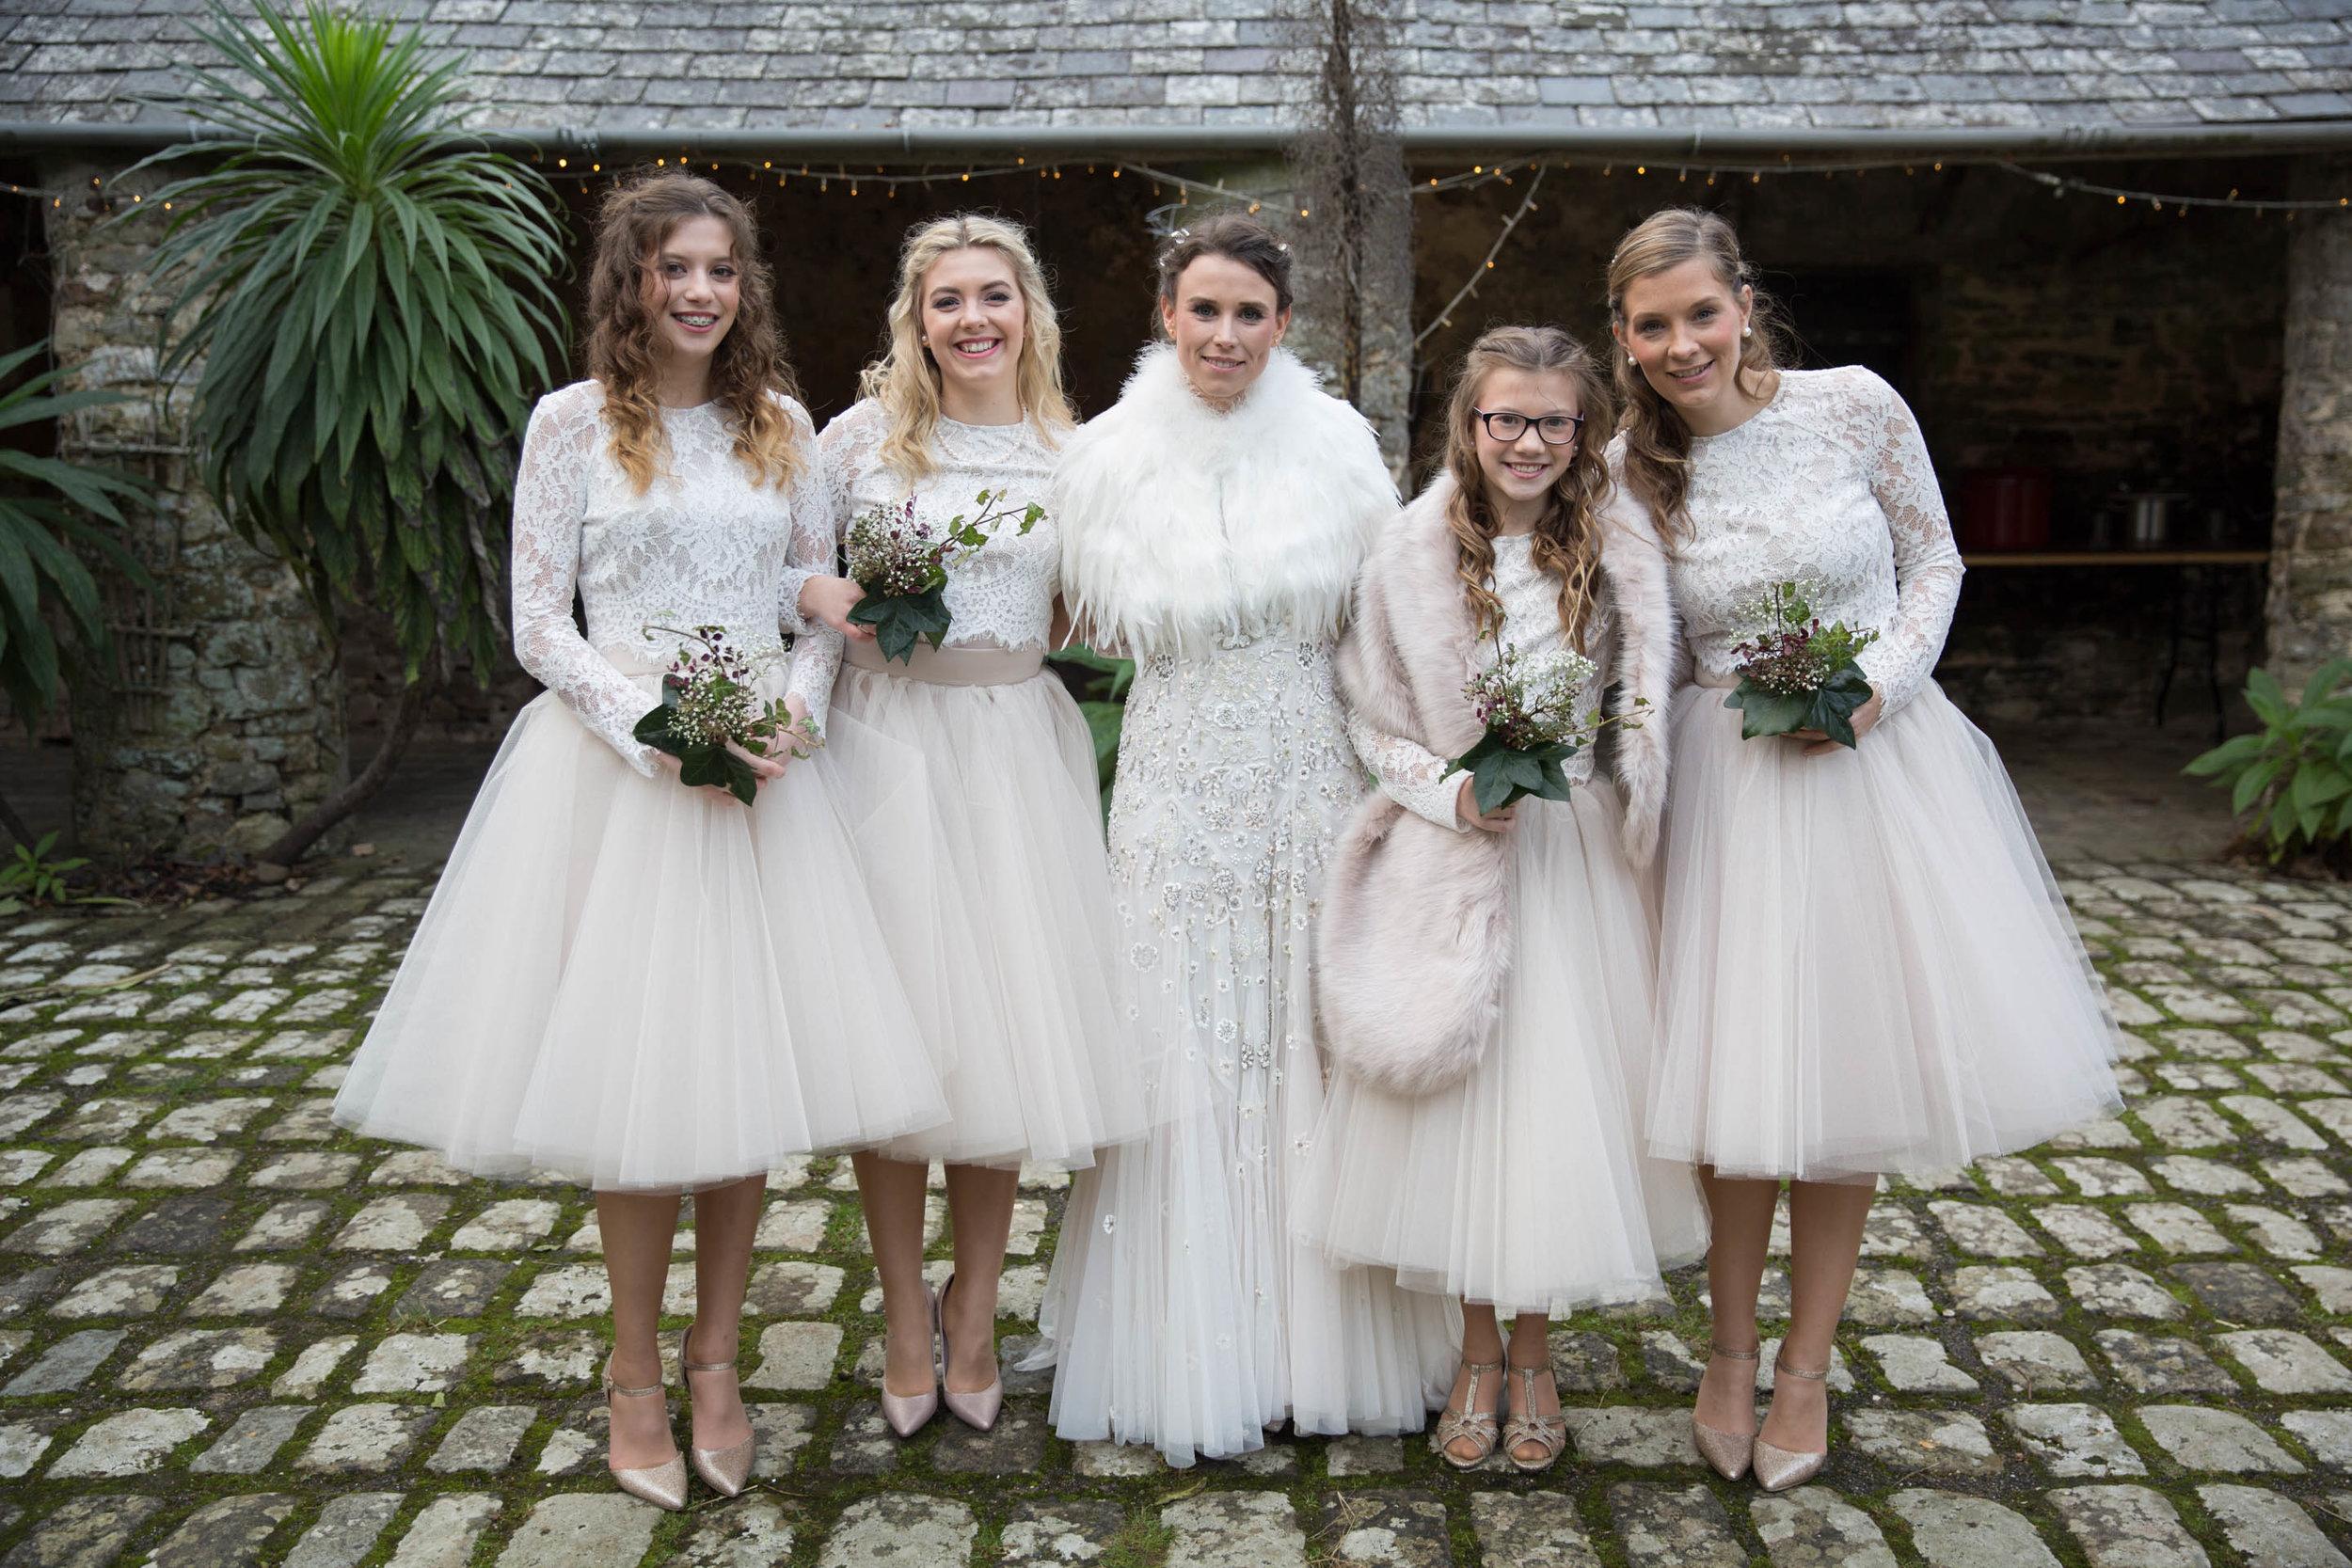 Jess & Ben - Bristol Wedding Photographer - Wright Wedding Photography - 99